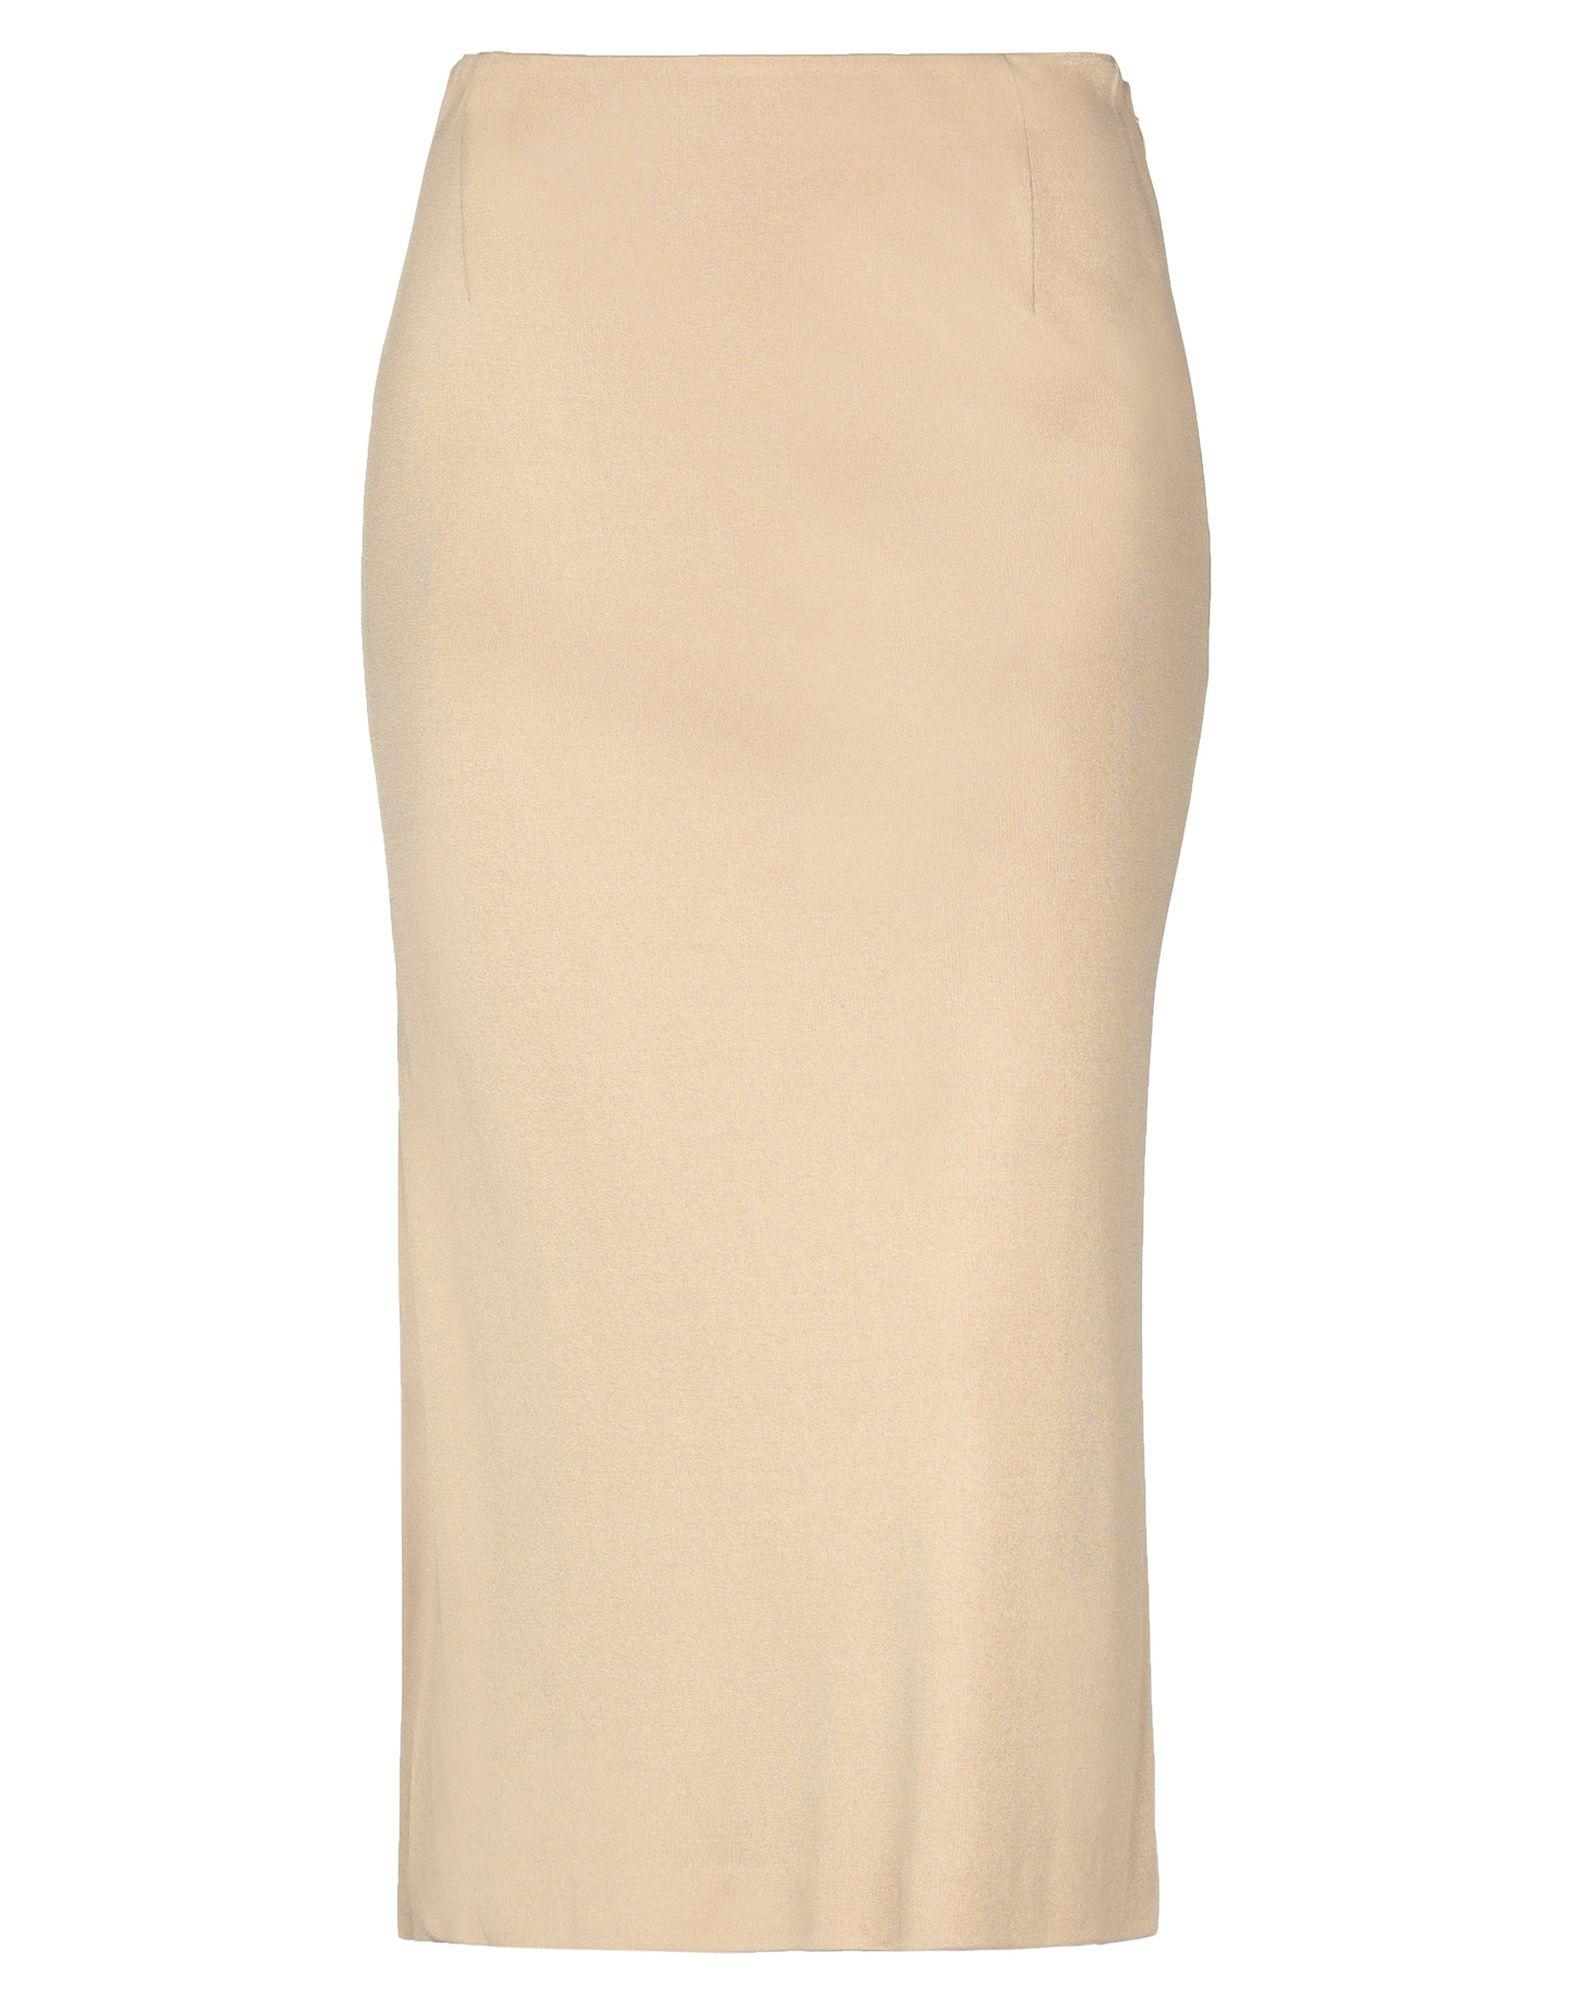 Фото - RALPH LAUREN BLACK LABEL Юбка длиной 3/4 ralph lauren collection юбка длиной 3 4